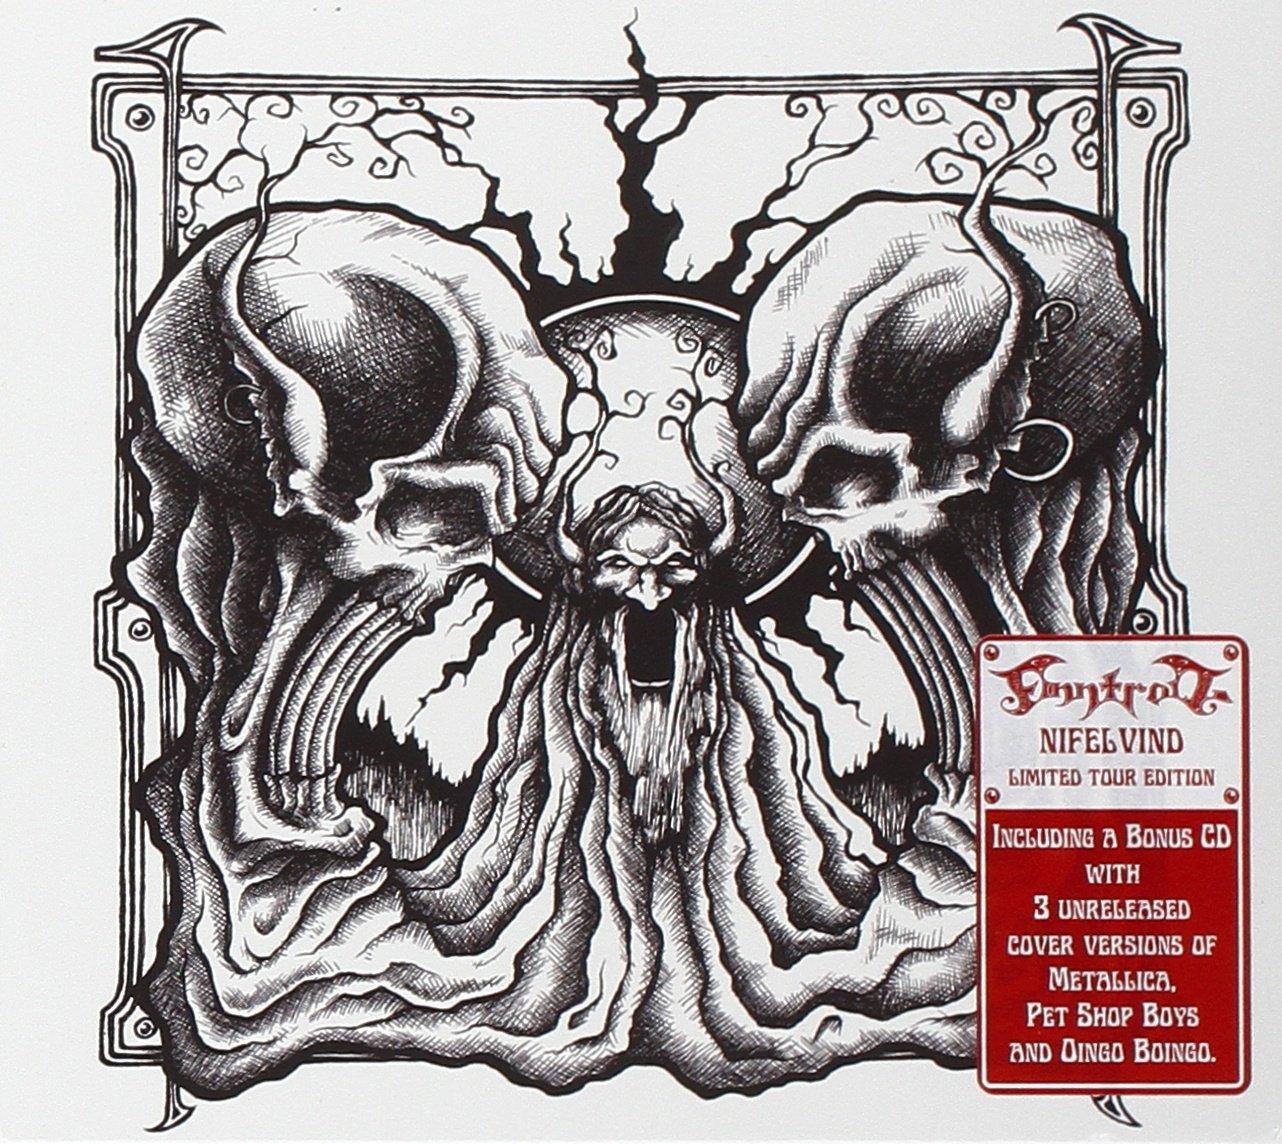 VA - Nightmare - The Global Hardcore Gathering-2CD-2011